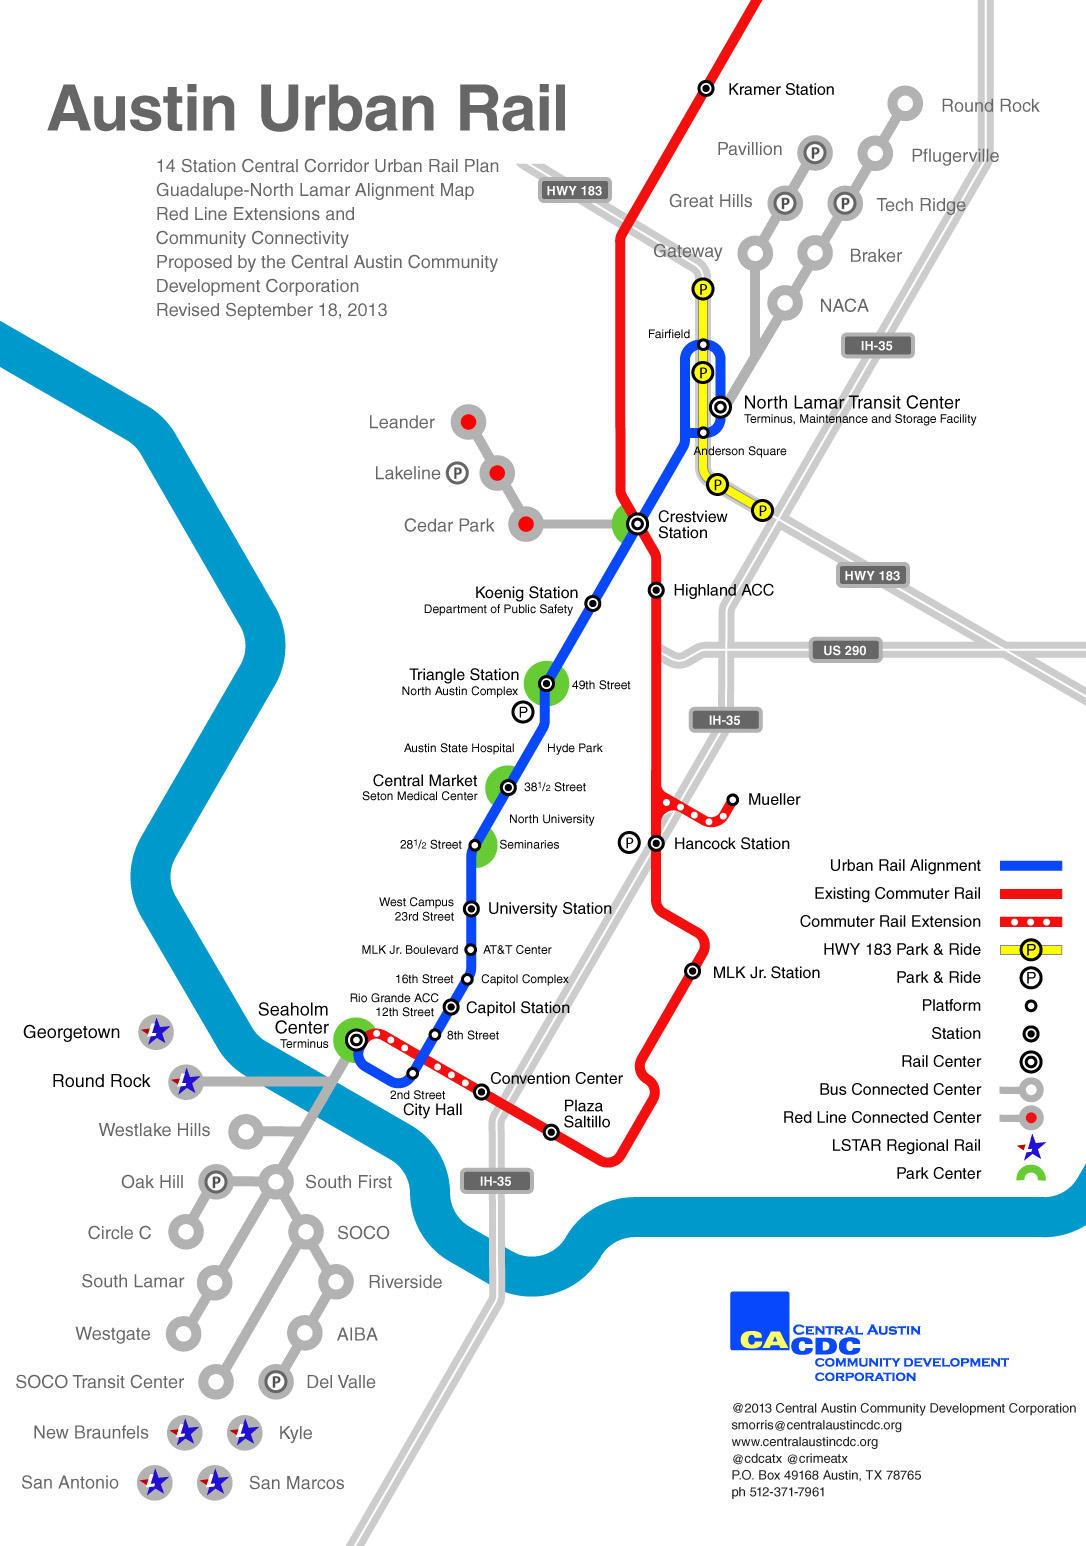 Austin Urban Rail in 7 Maps | KUT on